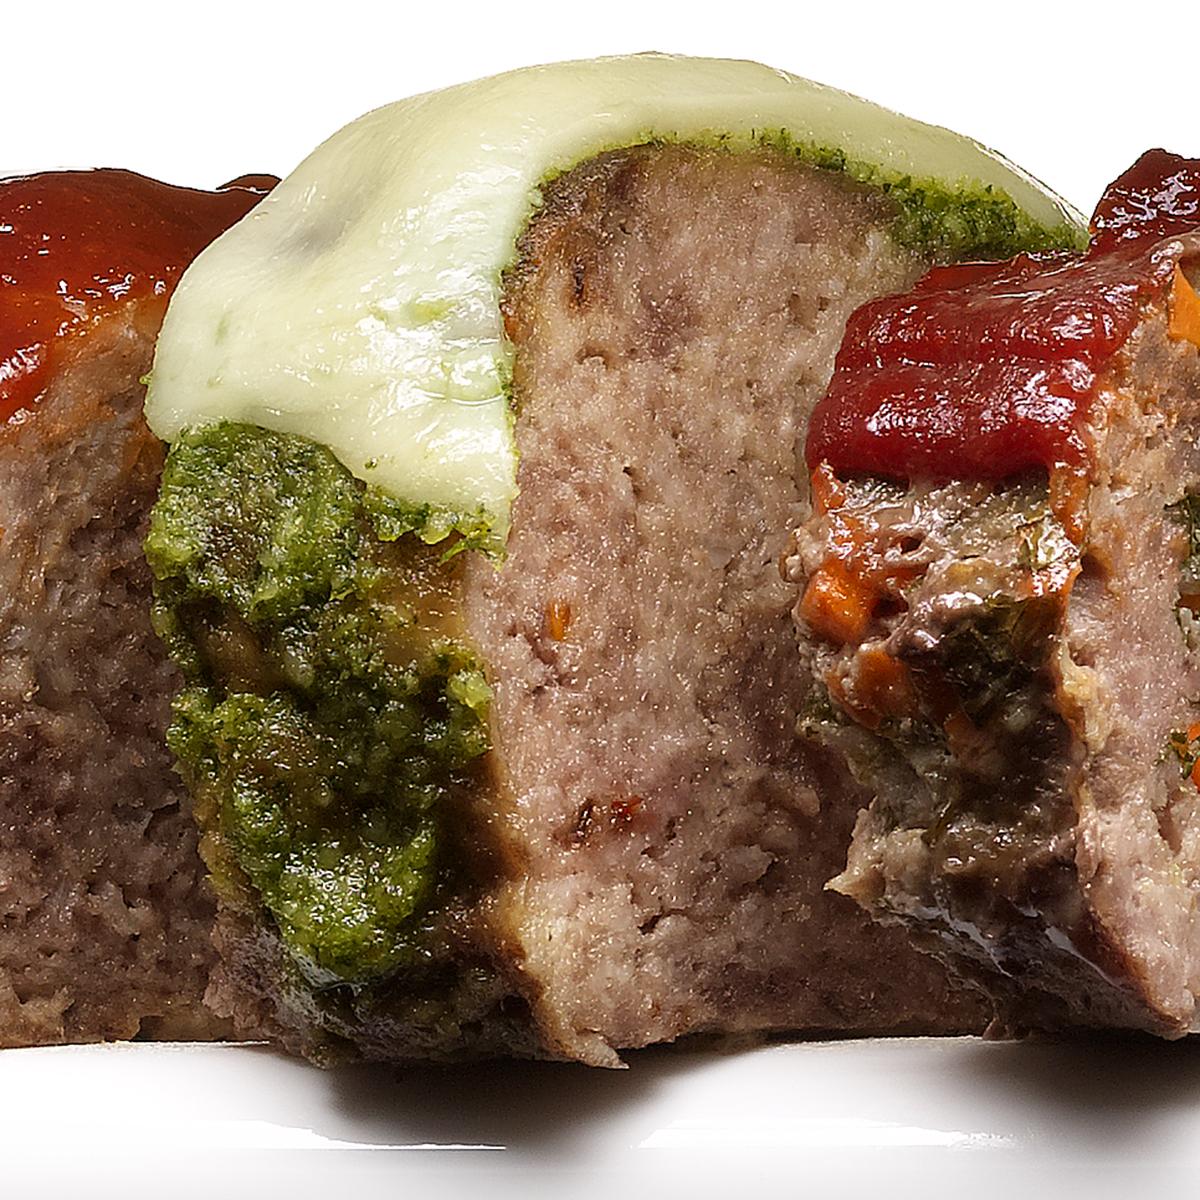 Arugula Pesto Meatloaf